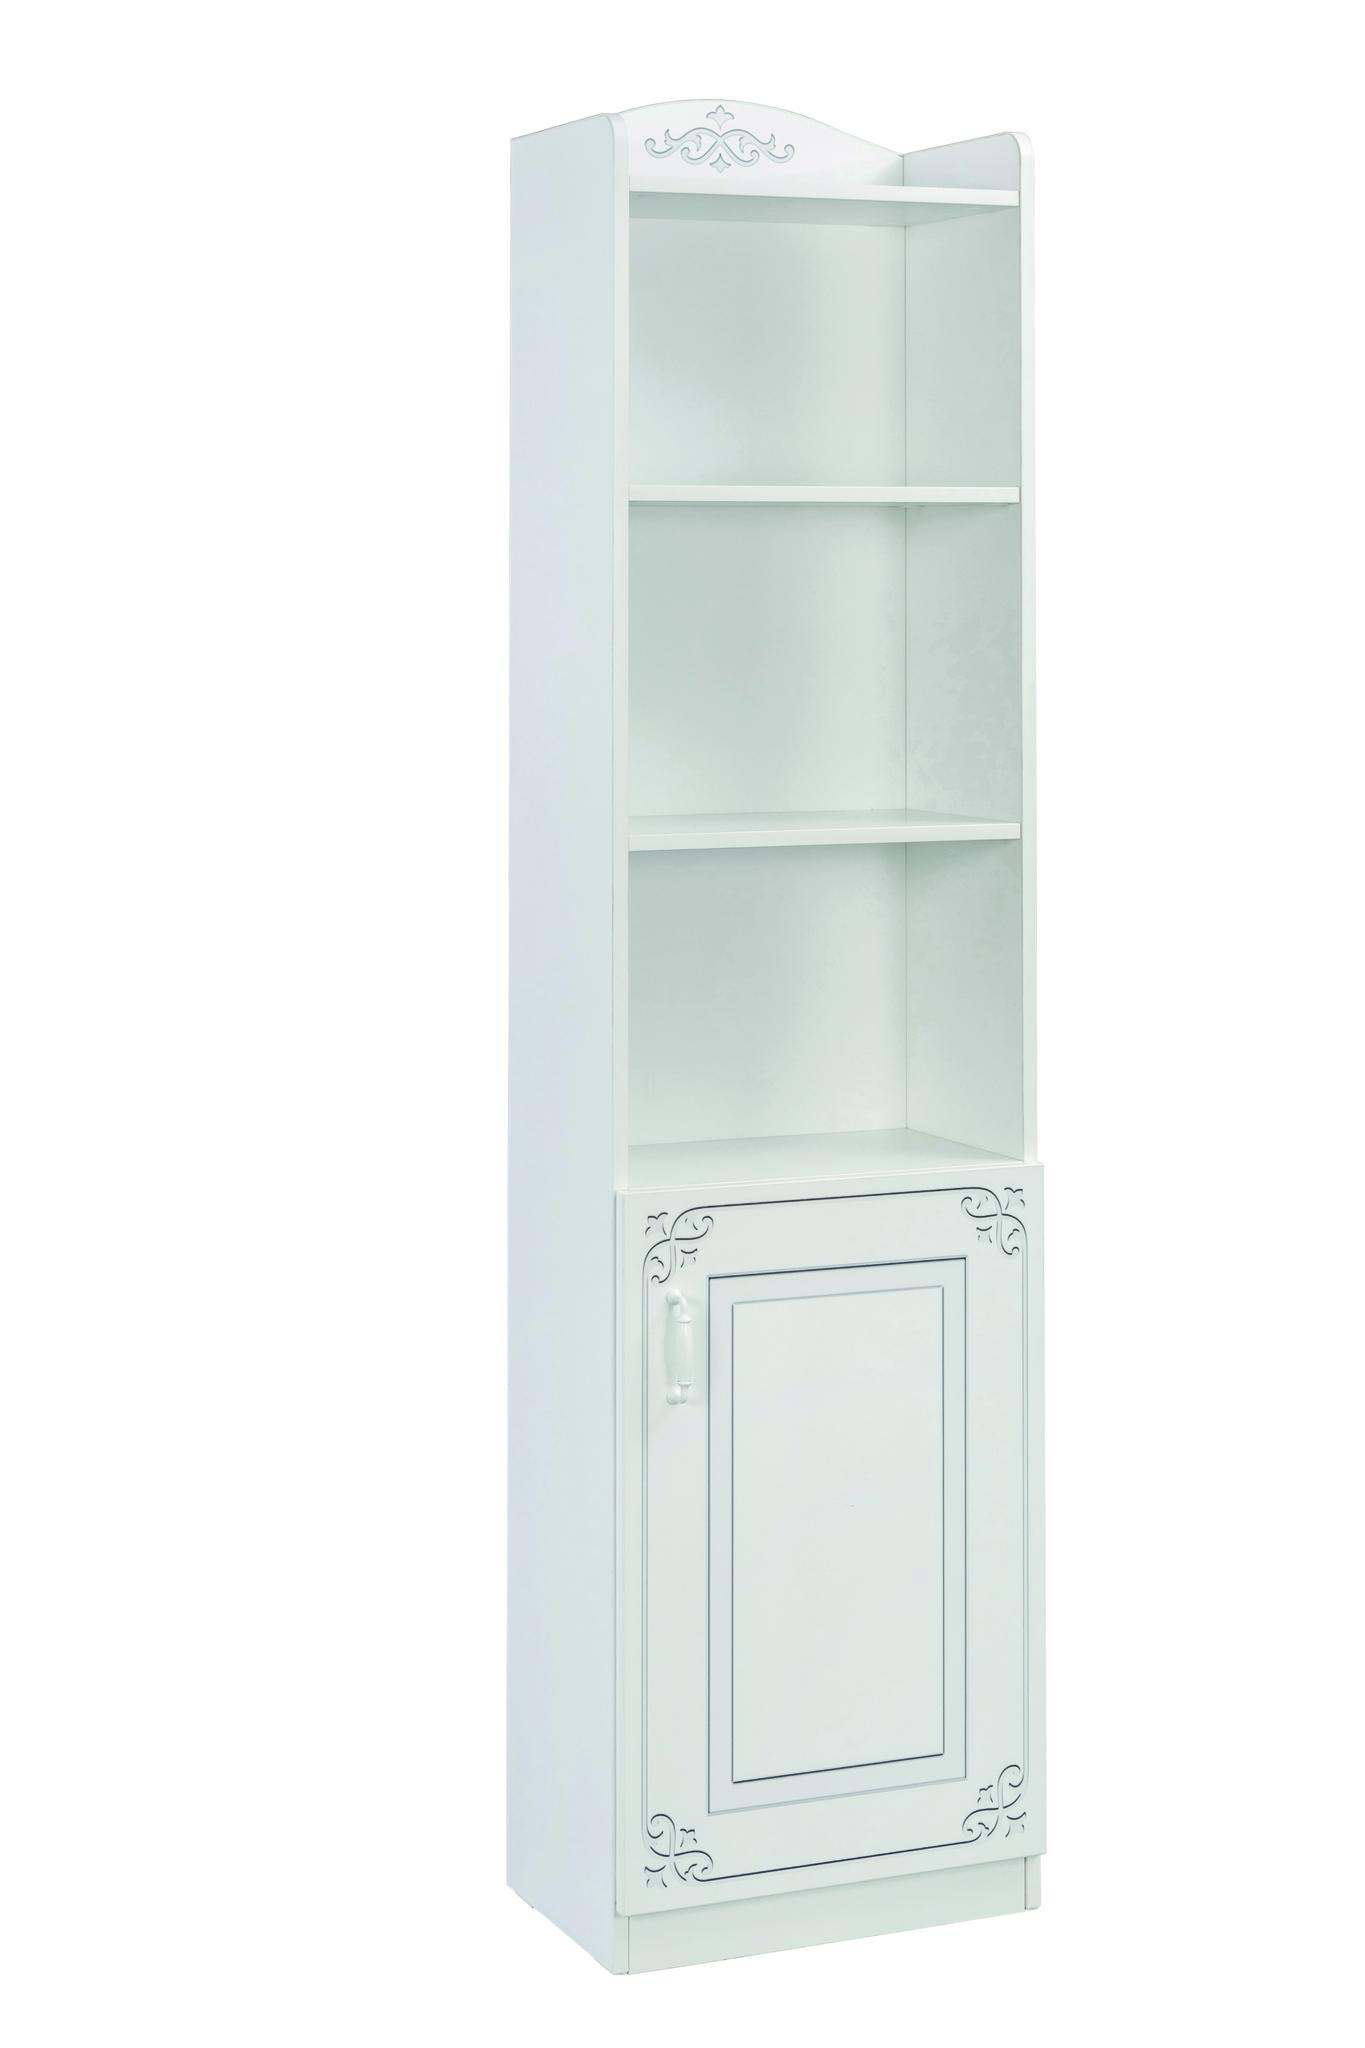 Biblioteca din pal cu 1 usa, pentru tineret Selena White, l46xA34xH185 cm